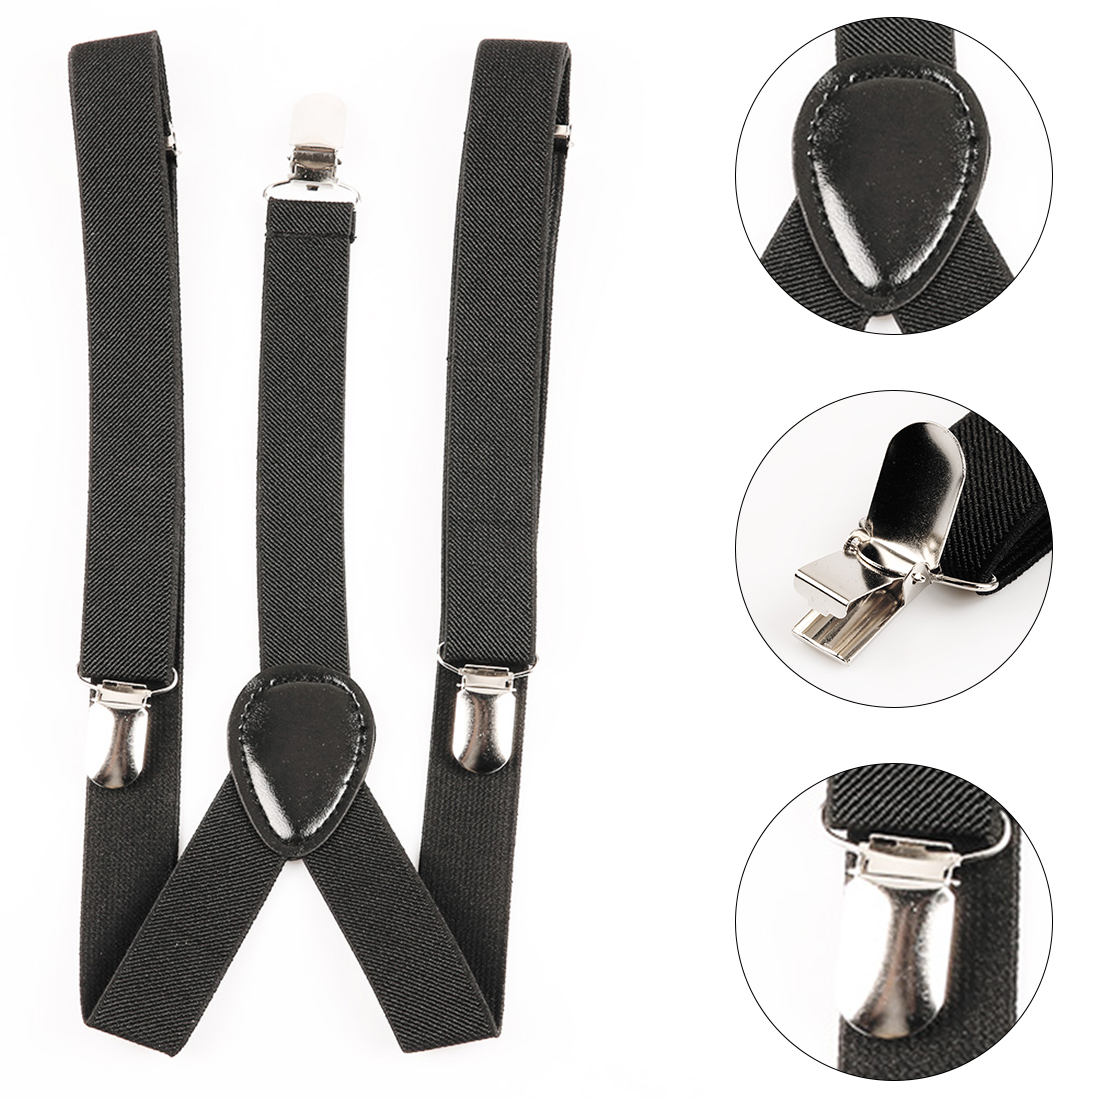 1PC Mens Womens Unisex Clip-on Suspenders Elastic Y-Shape Adjustable Braces Suits Elastic Striped